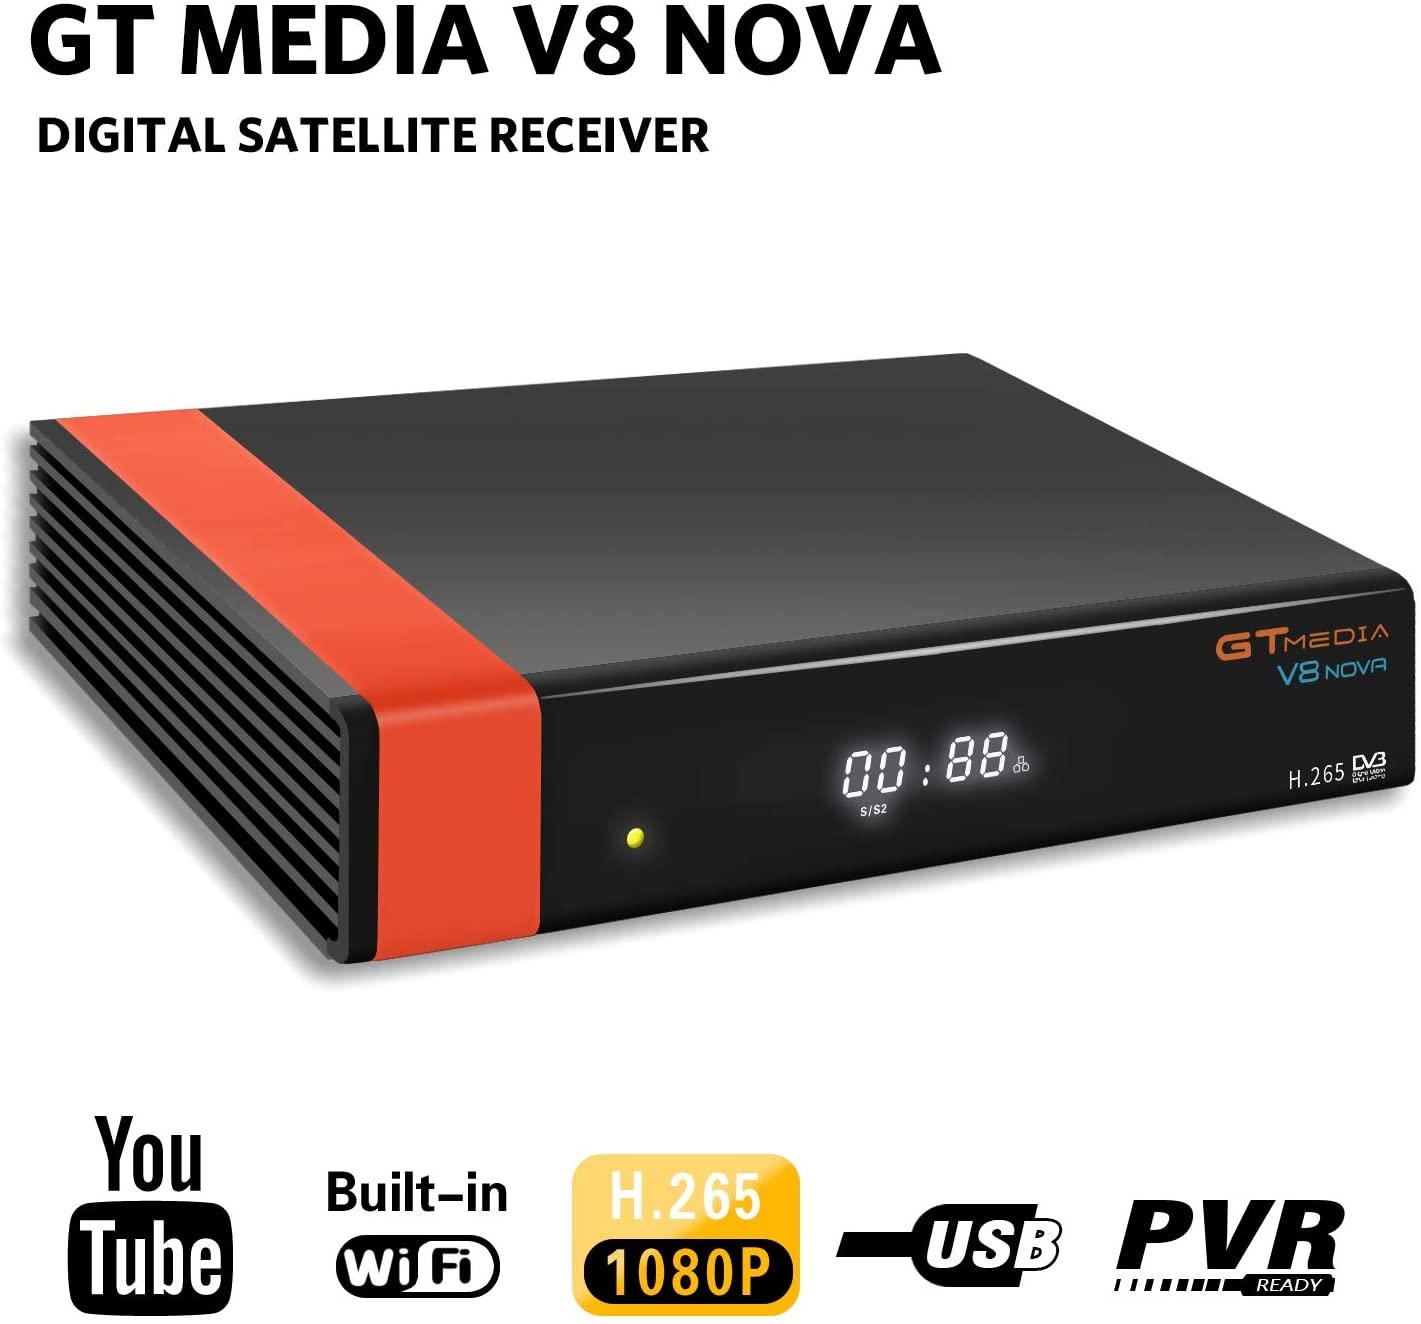 GT Media V8 Nova DVB-S2 Decodificador Satélite Receptor de TV Digital con Wi-Fi Incorporado / SCART / 1080P Full HD / FTA Soporte CC CAM, PVR Ready, Newcam, Youtube, PowerVu Dre Biss Clave por Aoxun